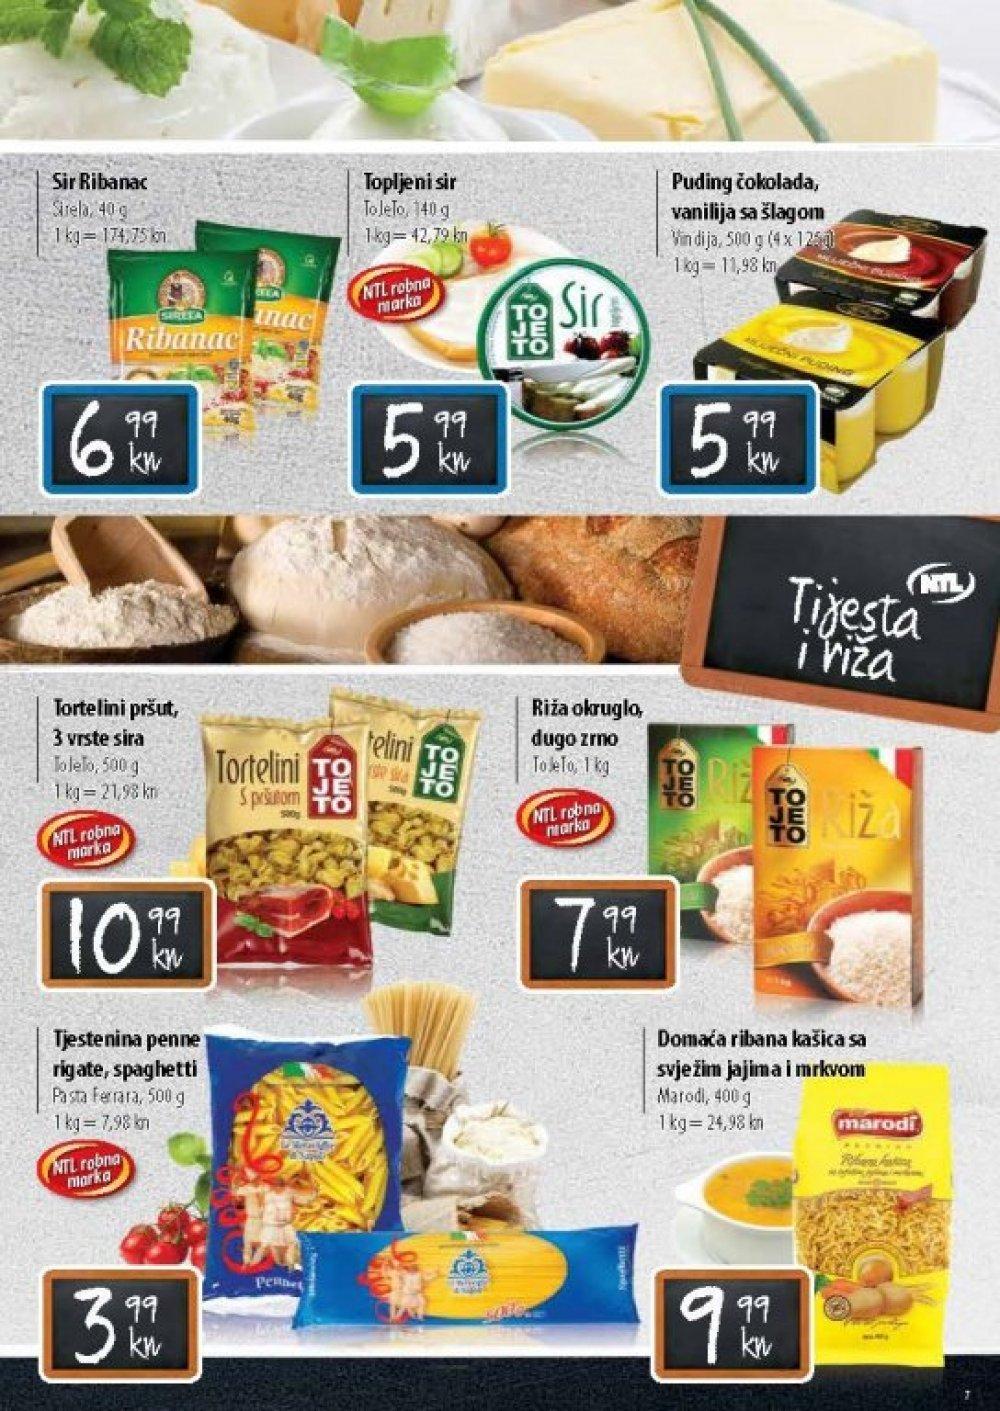 Studenac katalog Maxi akcija 31.08.-13.09.2017.